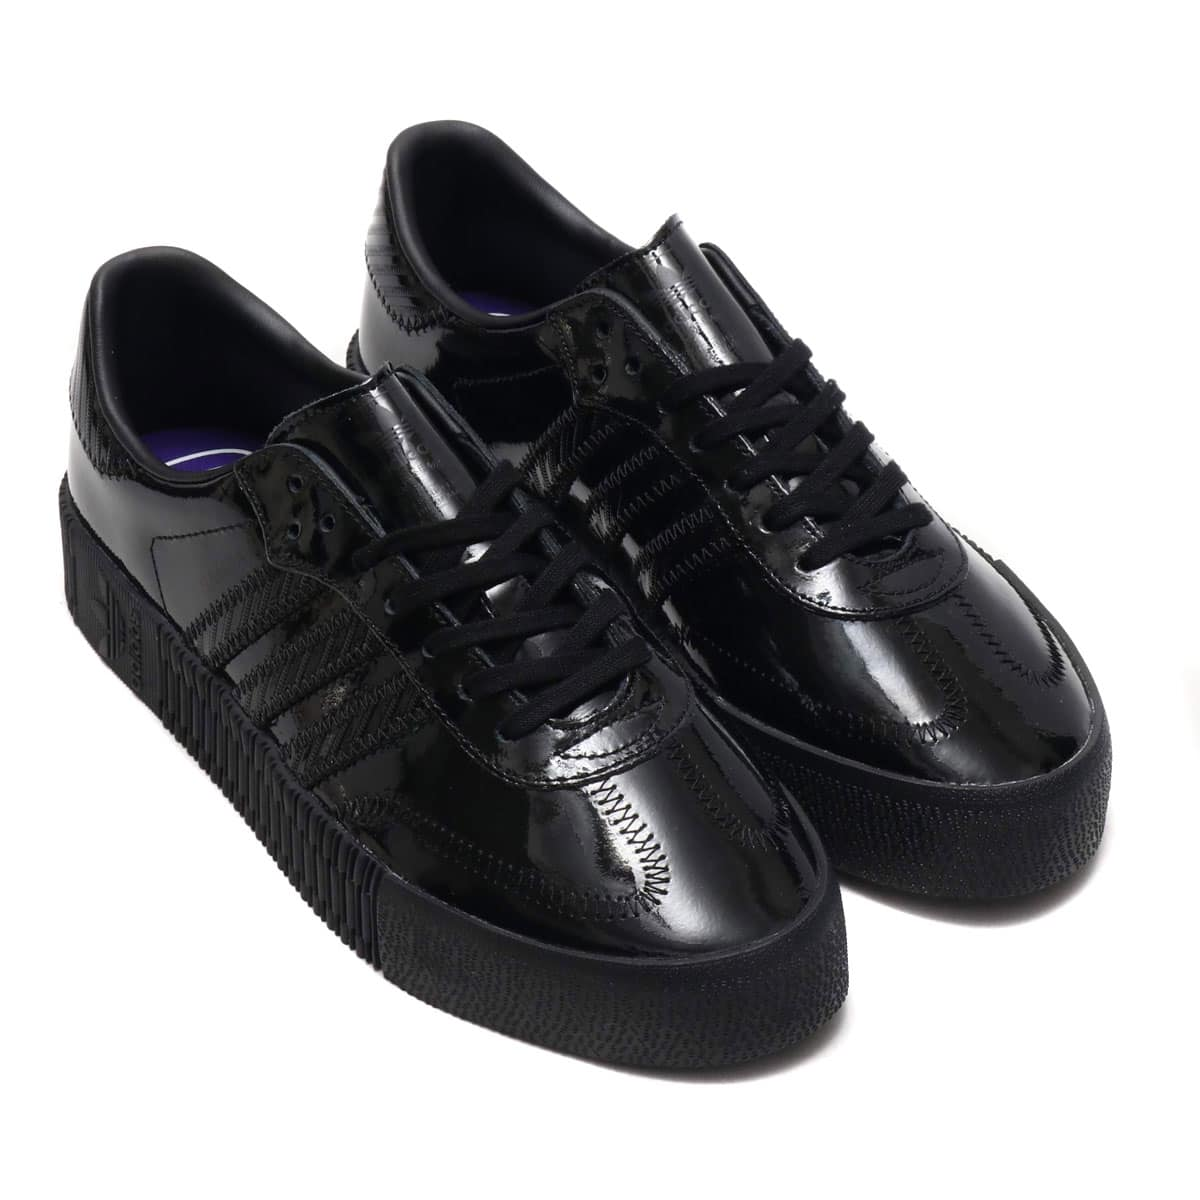 adidas Originals SAMBAROSE W CORE BLACK/CORE BLACK/ACTIVE PURPLE 19SS-I_photo_large